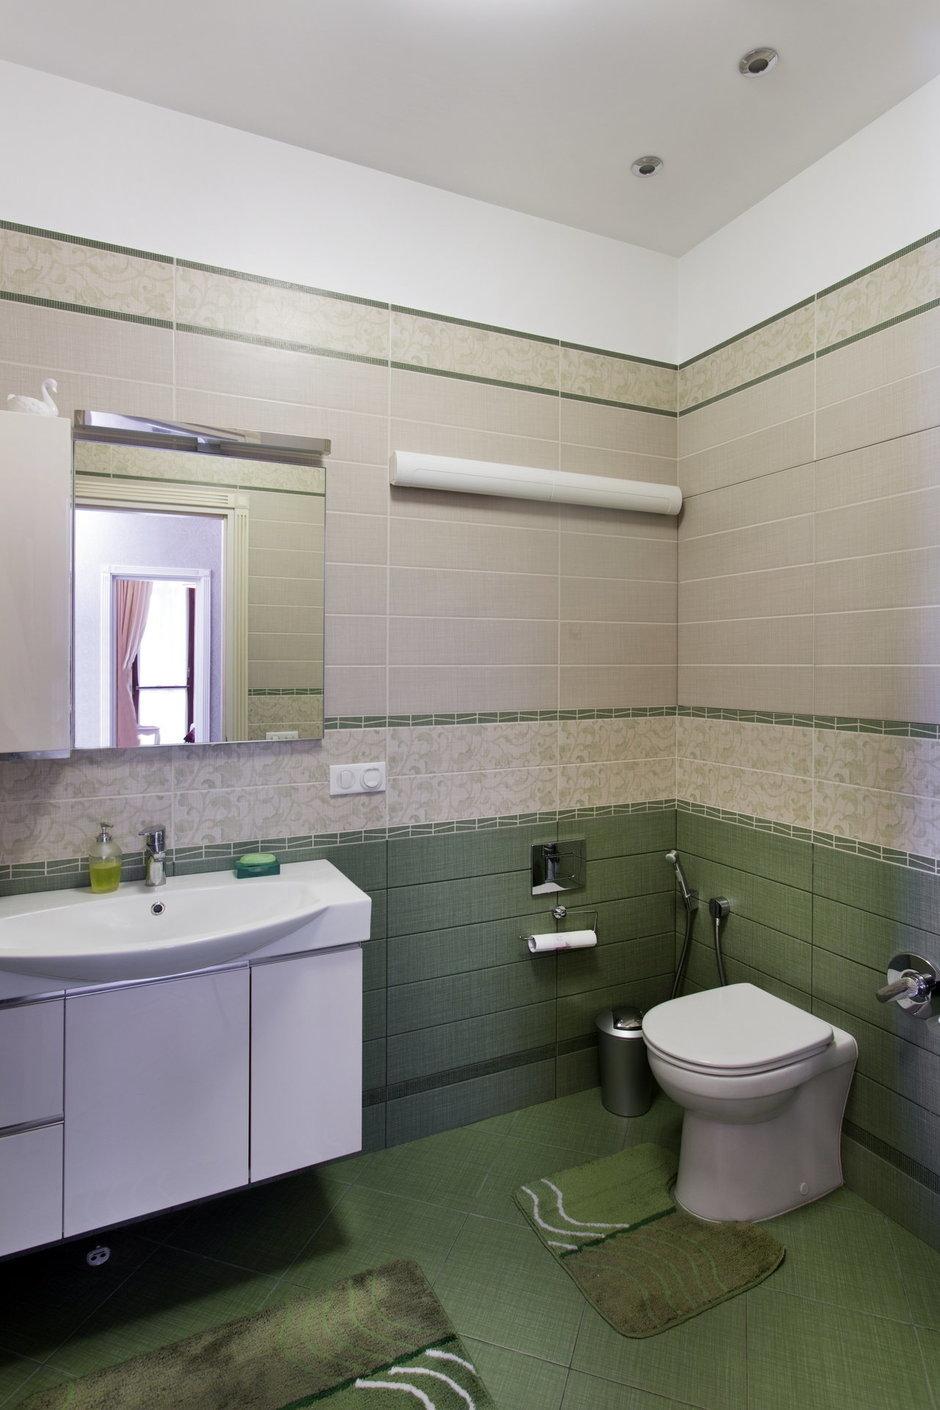 Фотография: Ванная в стиле Классический, Квартира, Дома и квартиры, Проект недели – фото на InMyRoom.ru